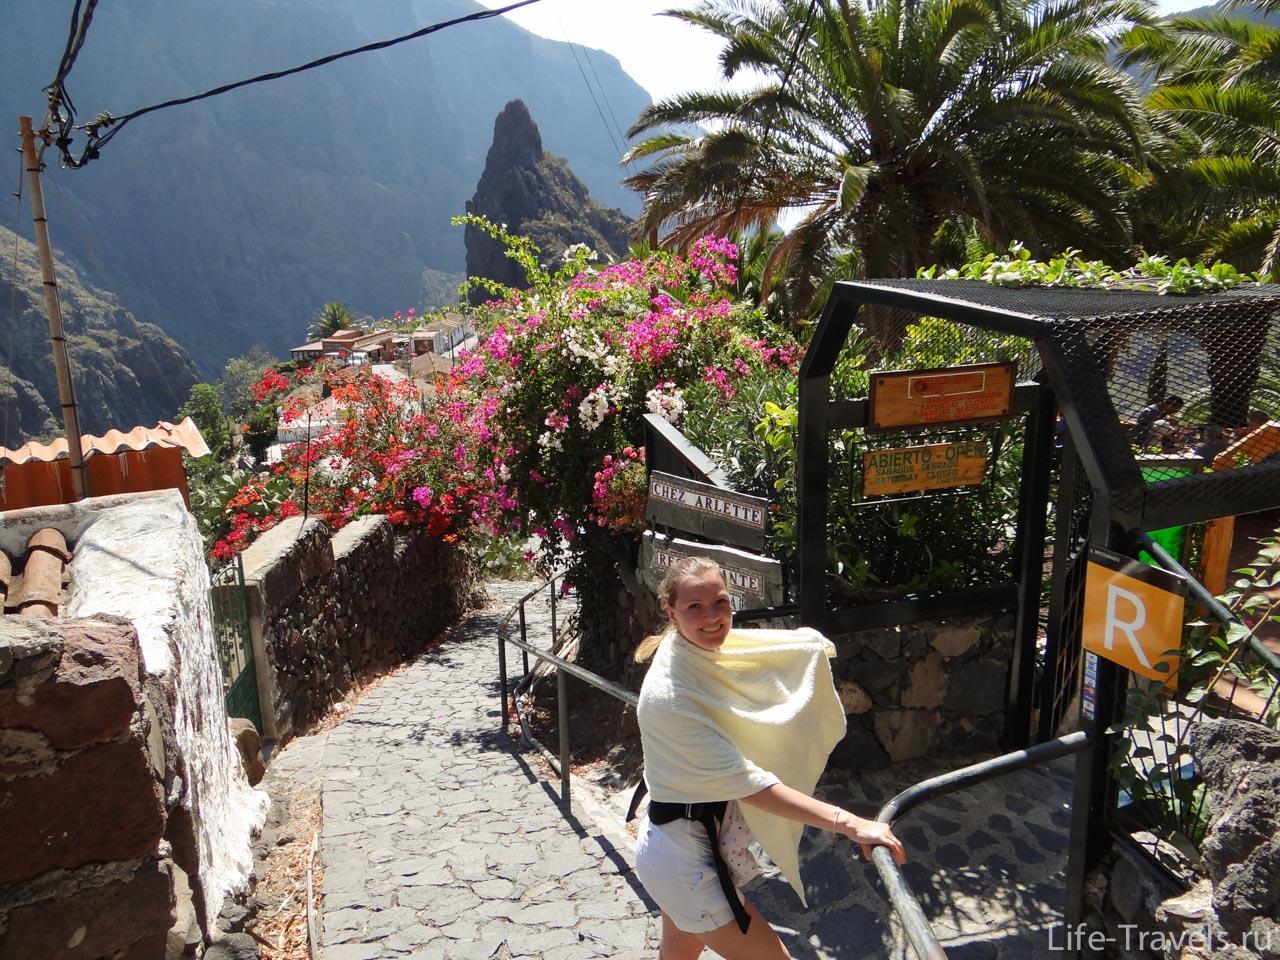 Village streets Masca